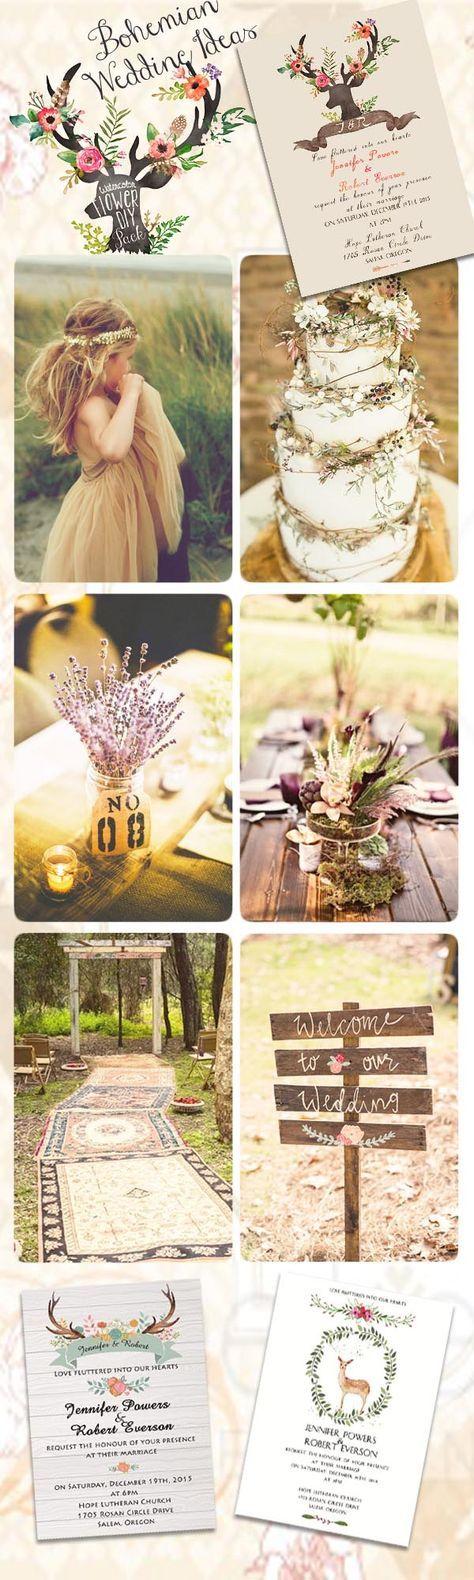 bohemian wedding ideas and rustic bohemian wedding invitation